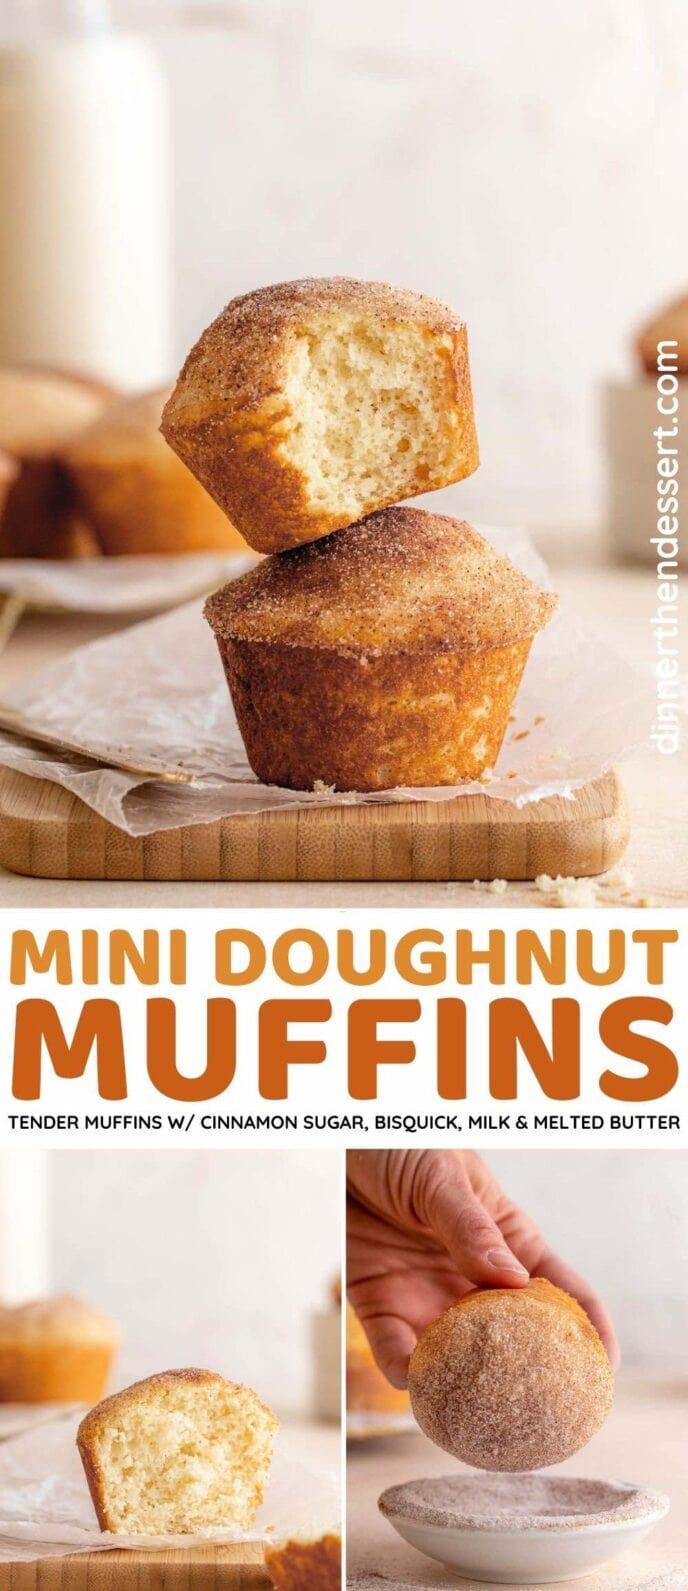 Mini Donut Muffins collage